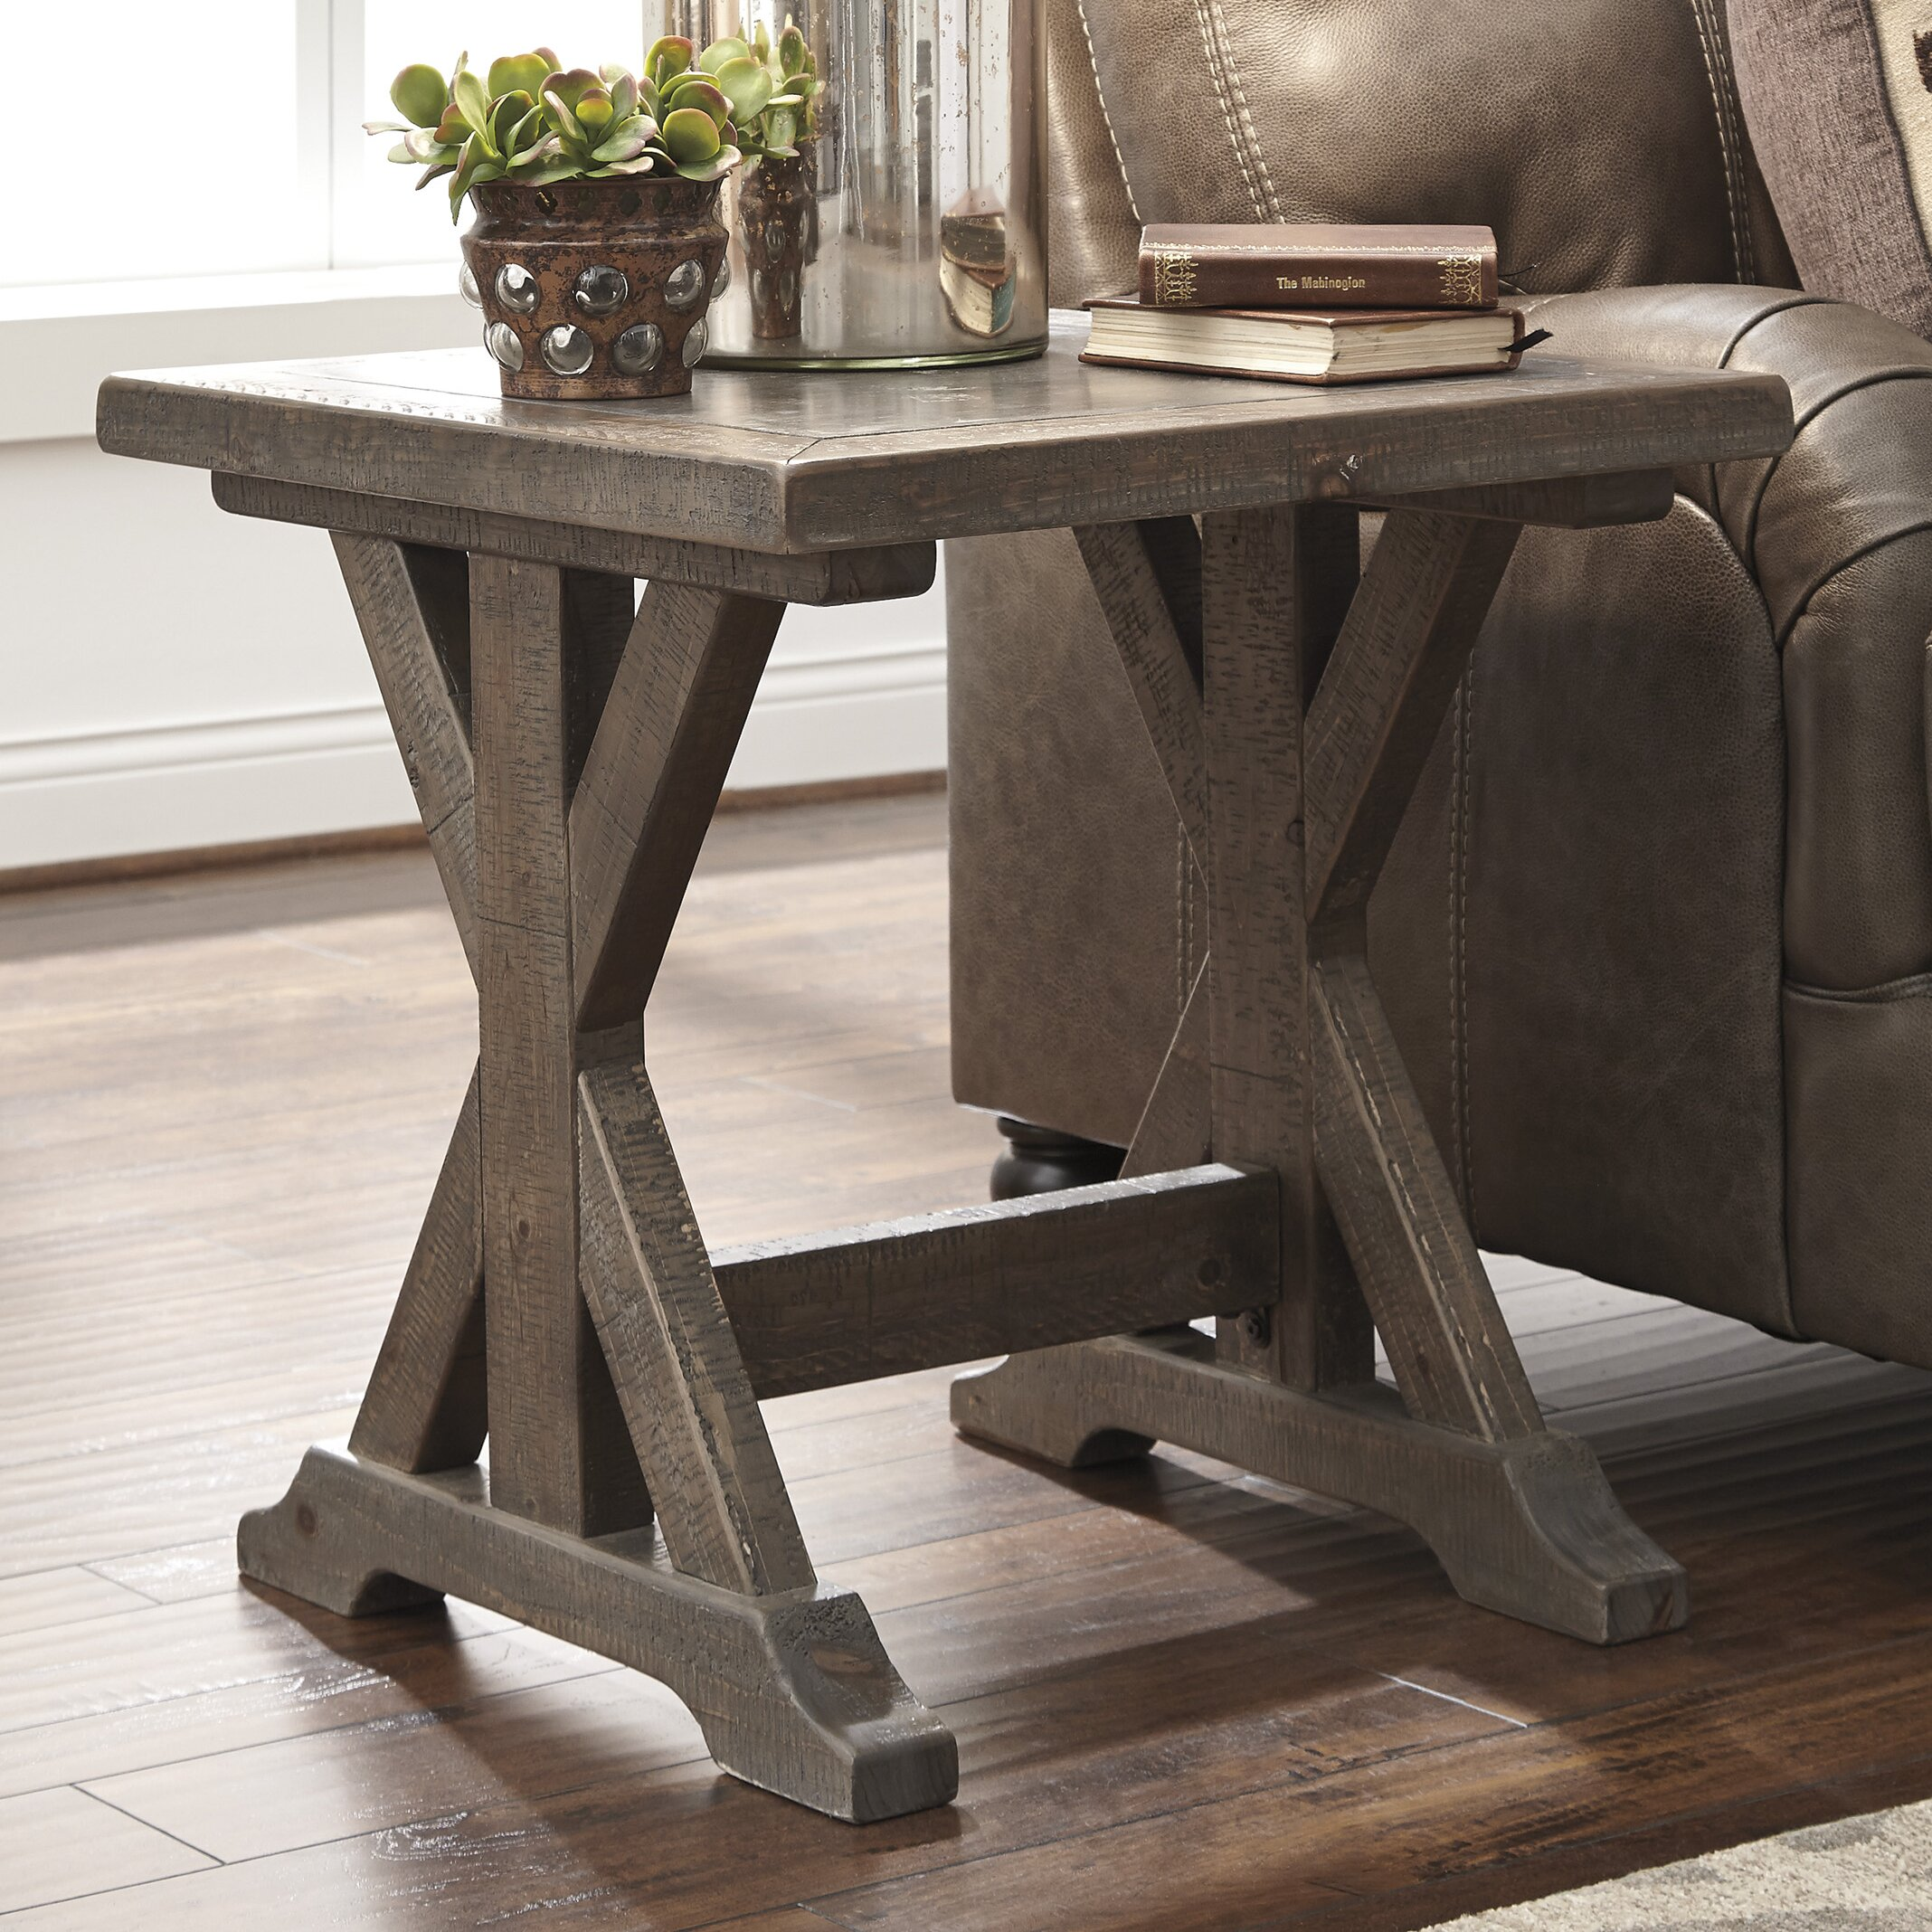 Laurel foundry modern farmhouse lidia end table reviews for Farmhouse end table set